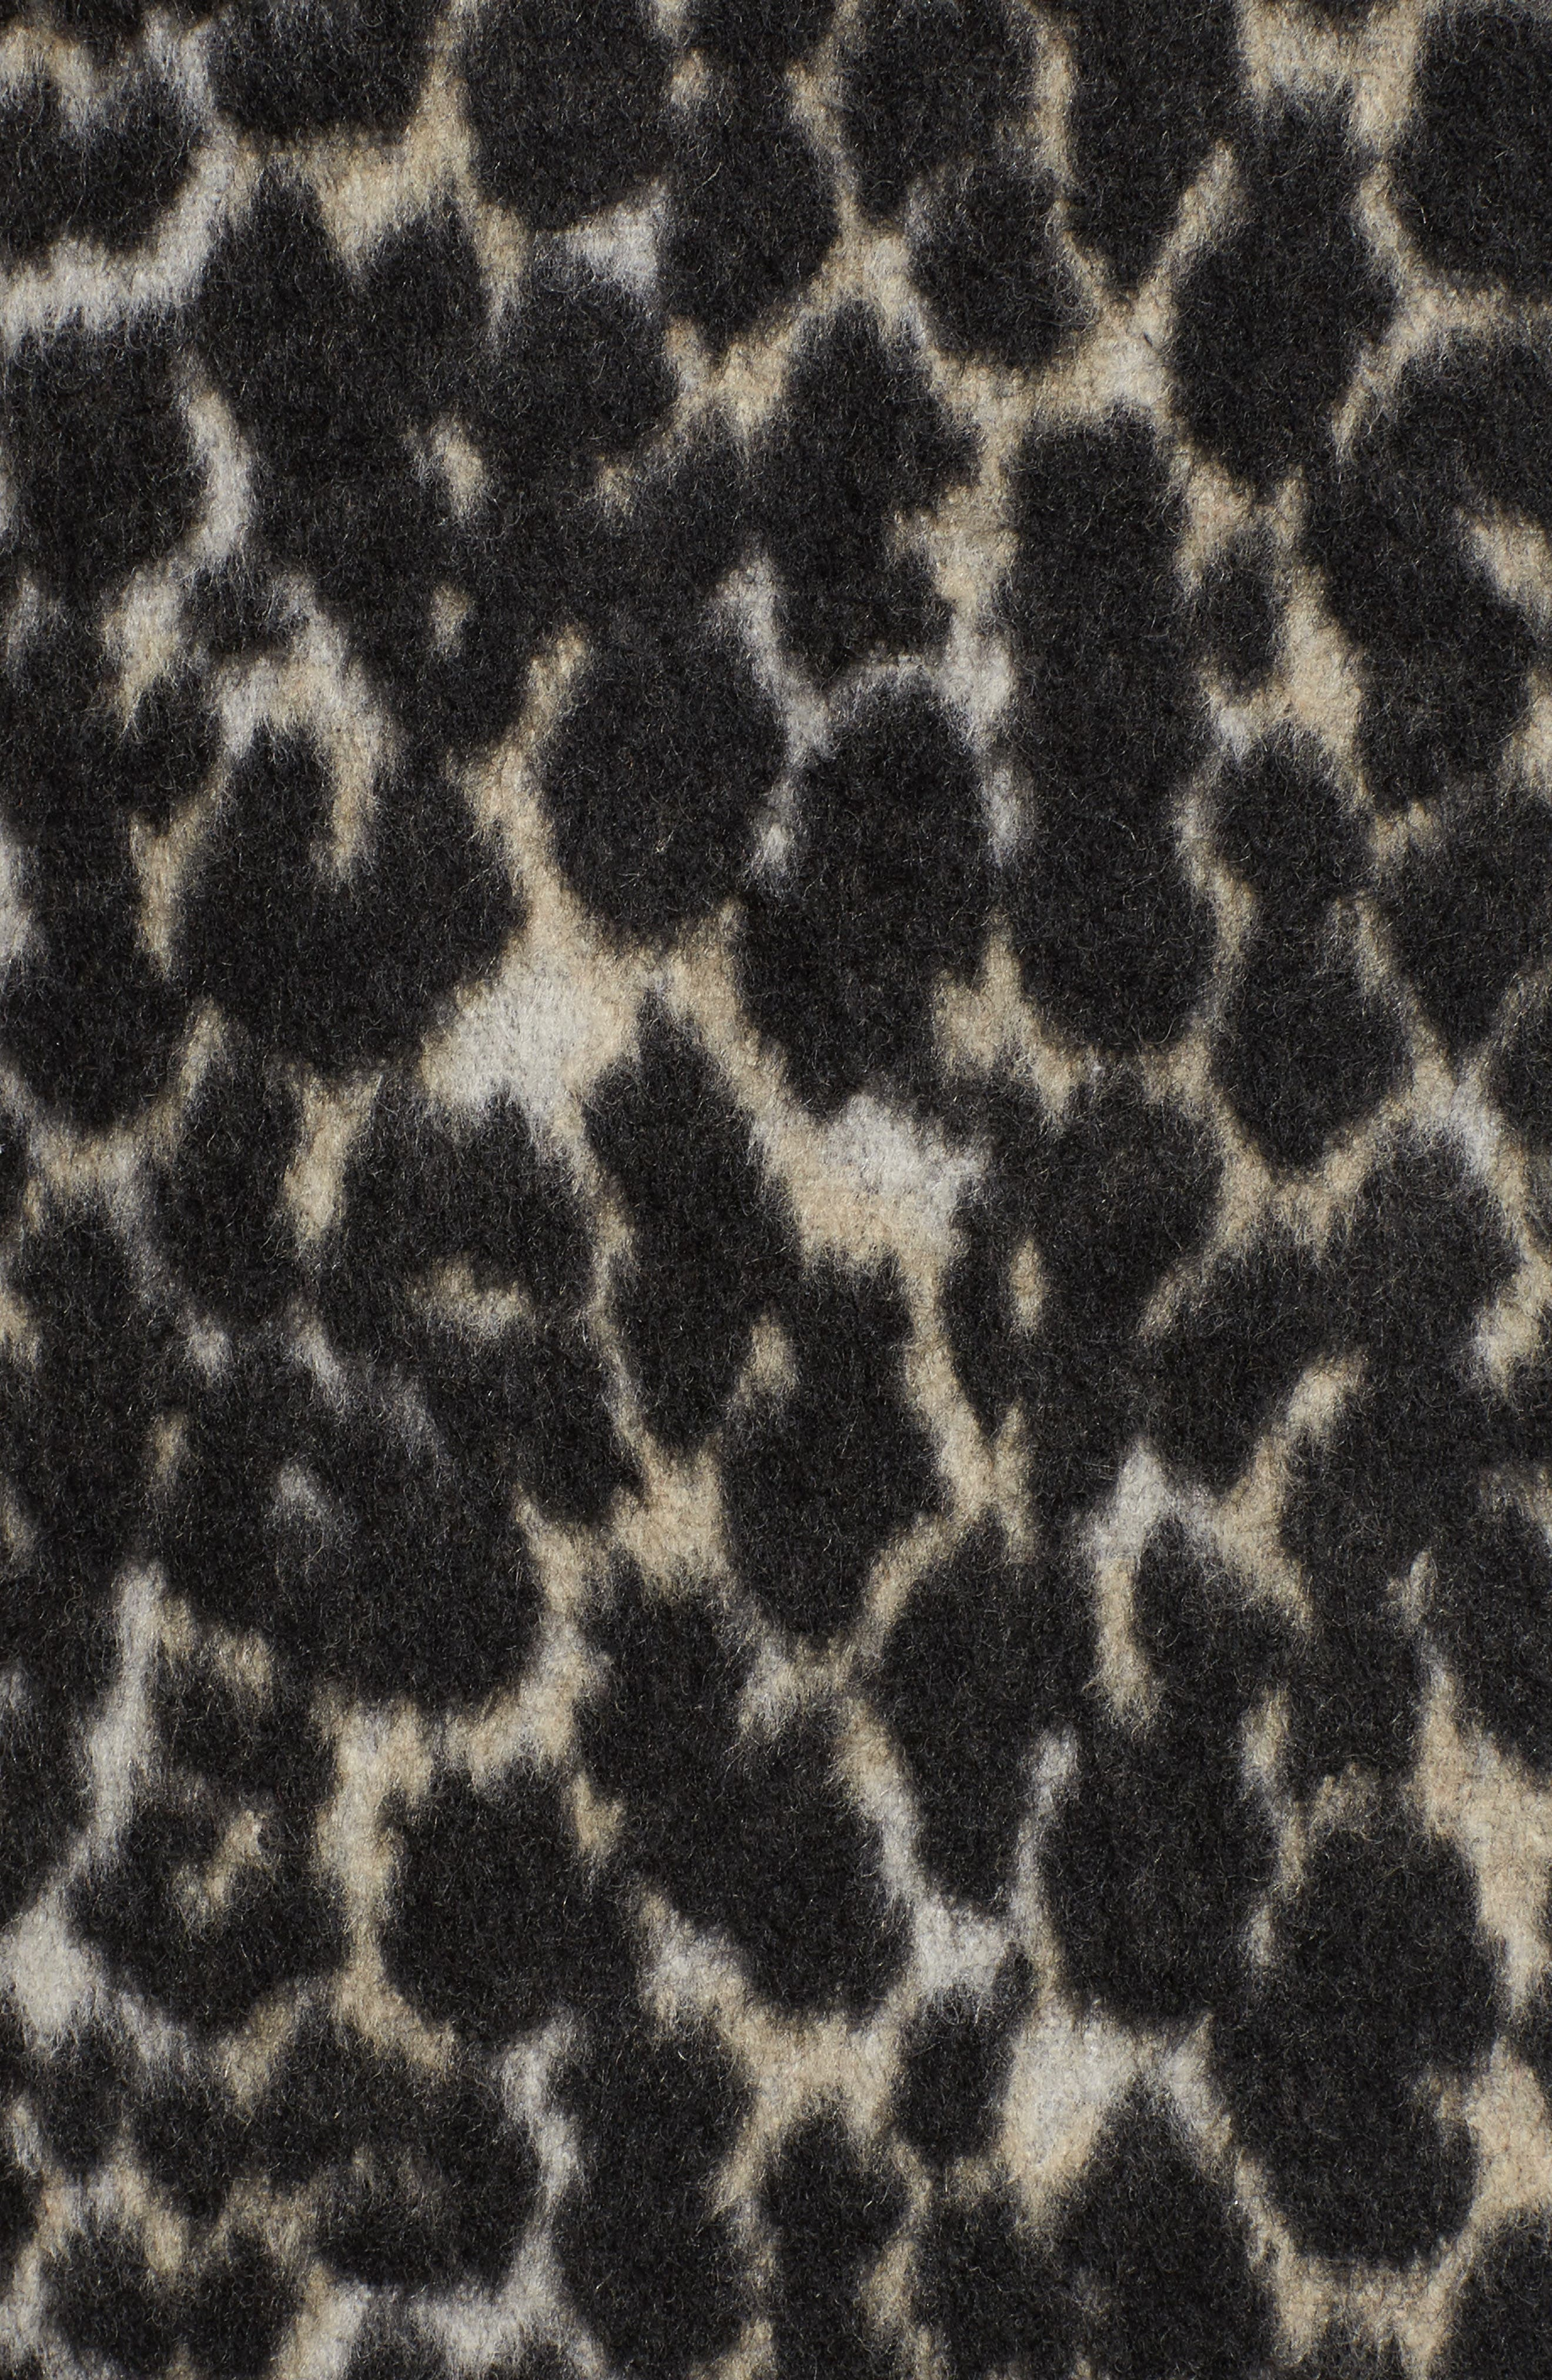 Leopard Print Longline Bomber Jacket,                             Alternate thumbnail 6, color,                             275